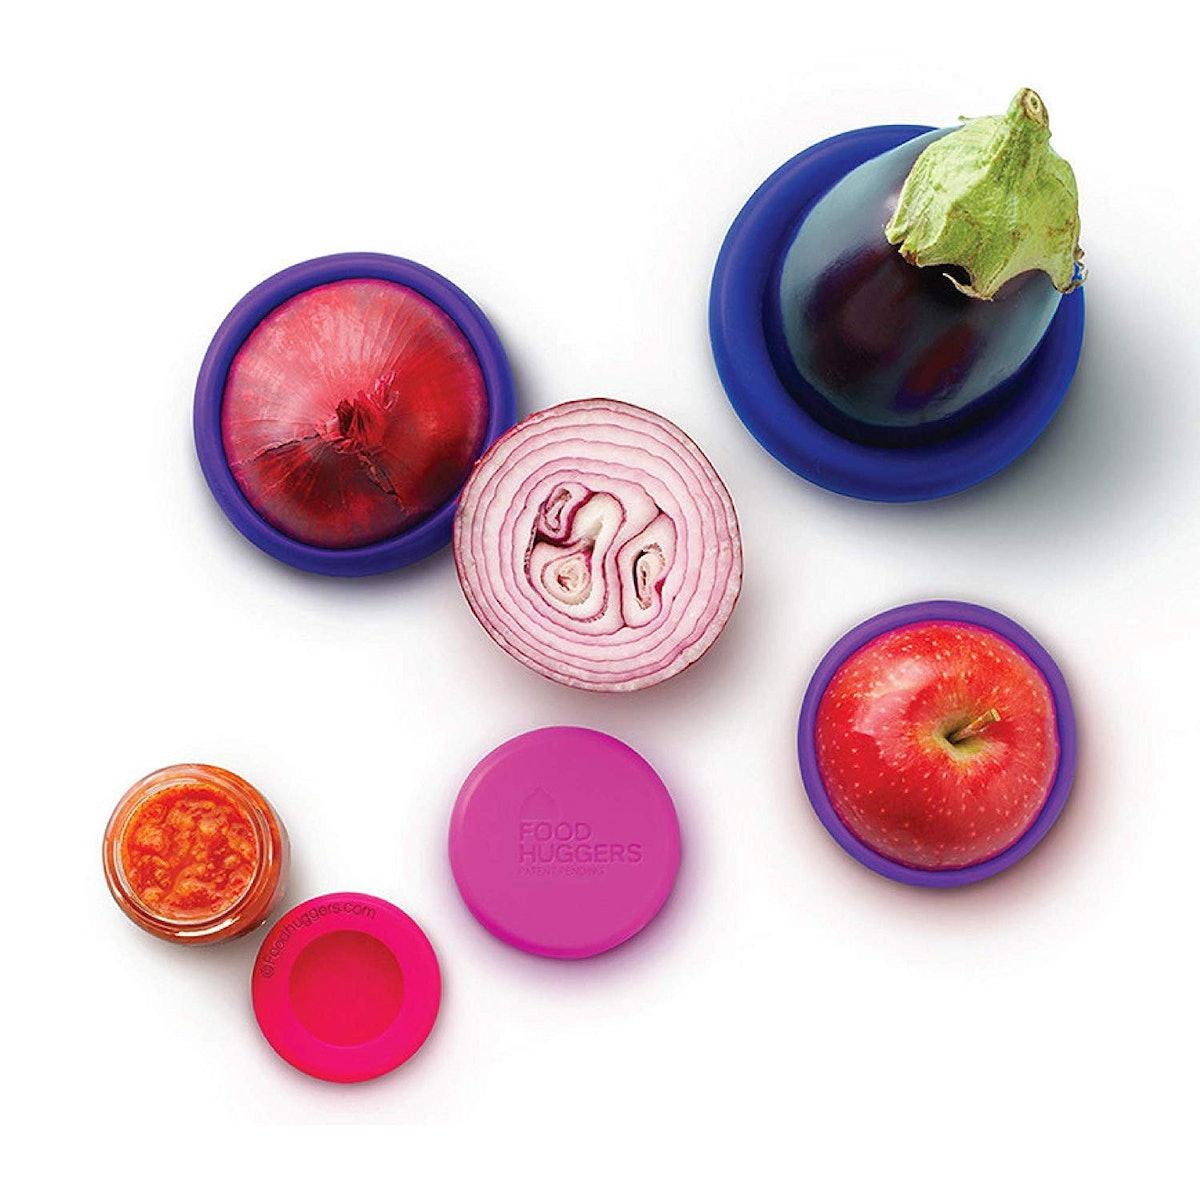 Food Huggers Silicone Food Savers (5-Piece Set)